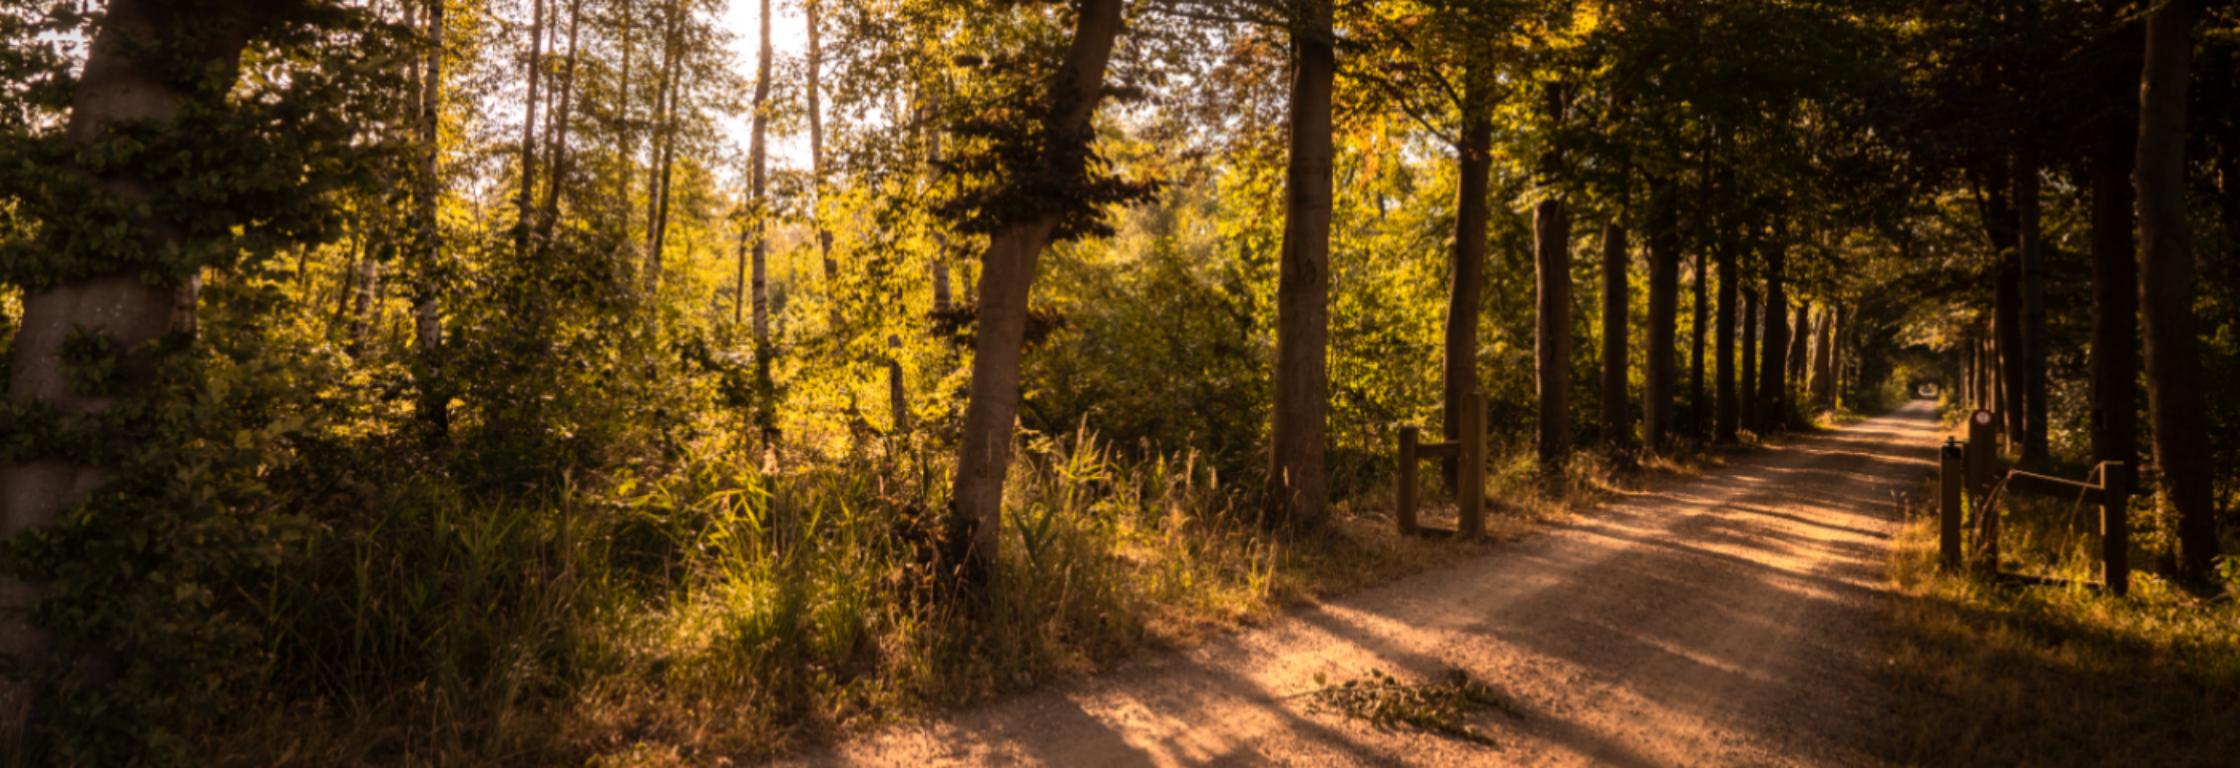 De favoriete hardlooproute van boswachter Hanne Tersmette